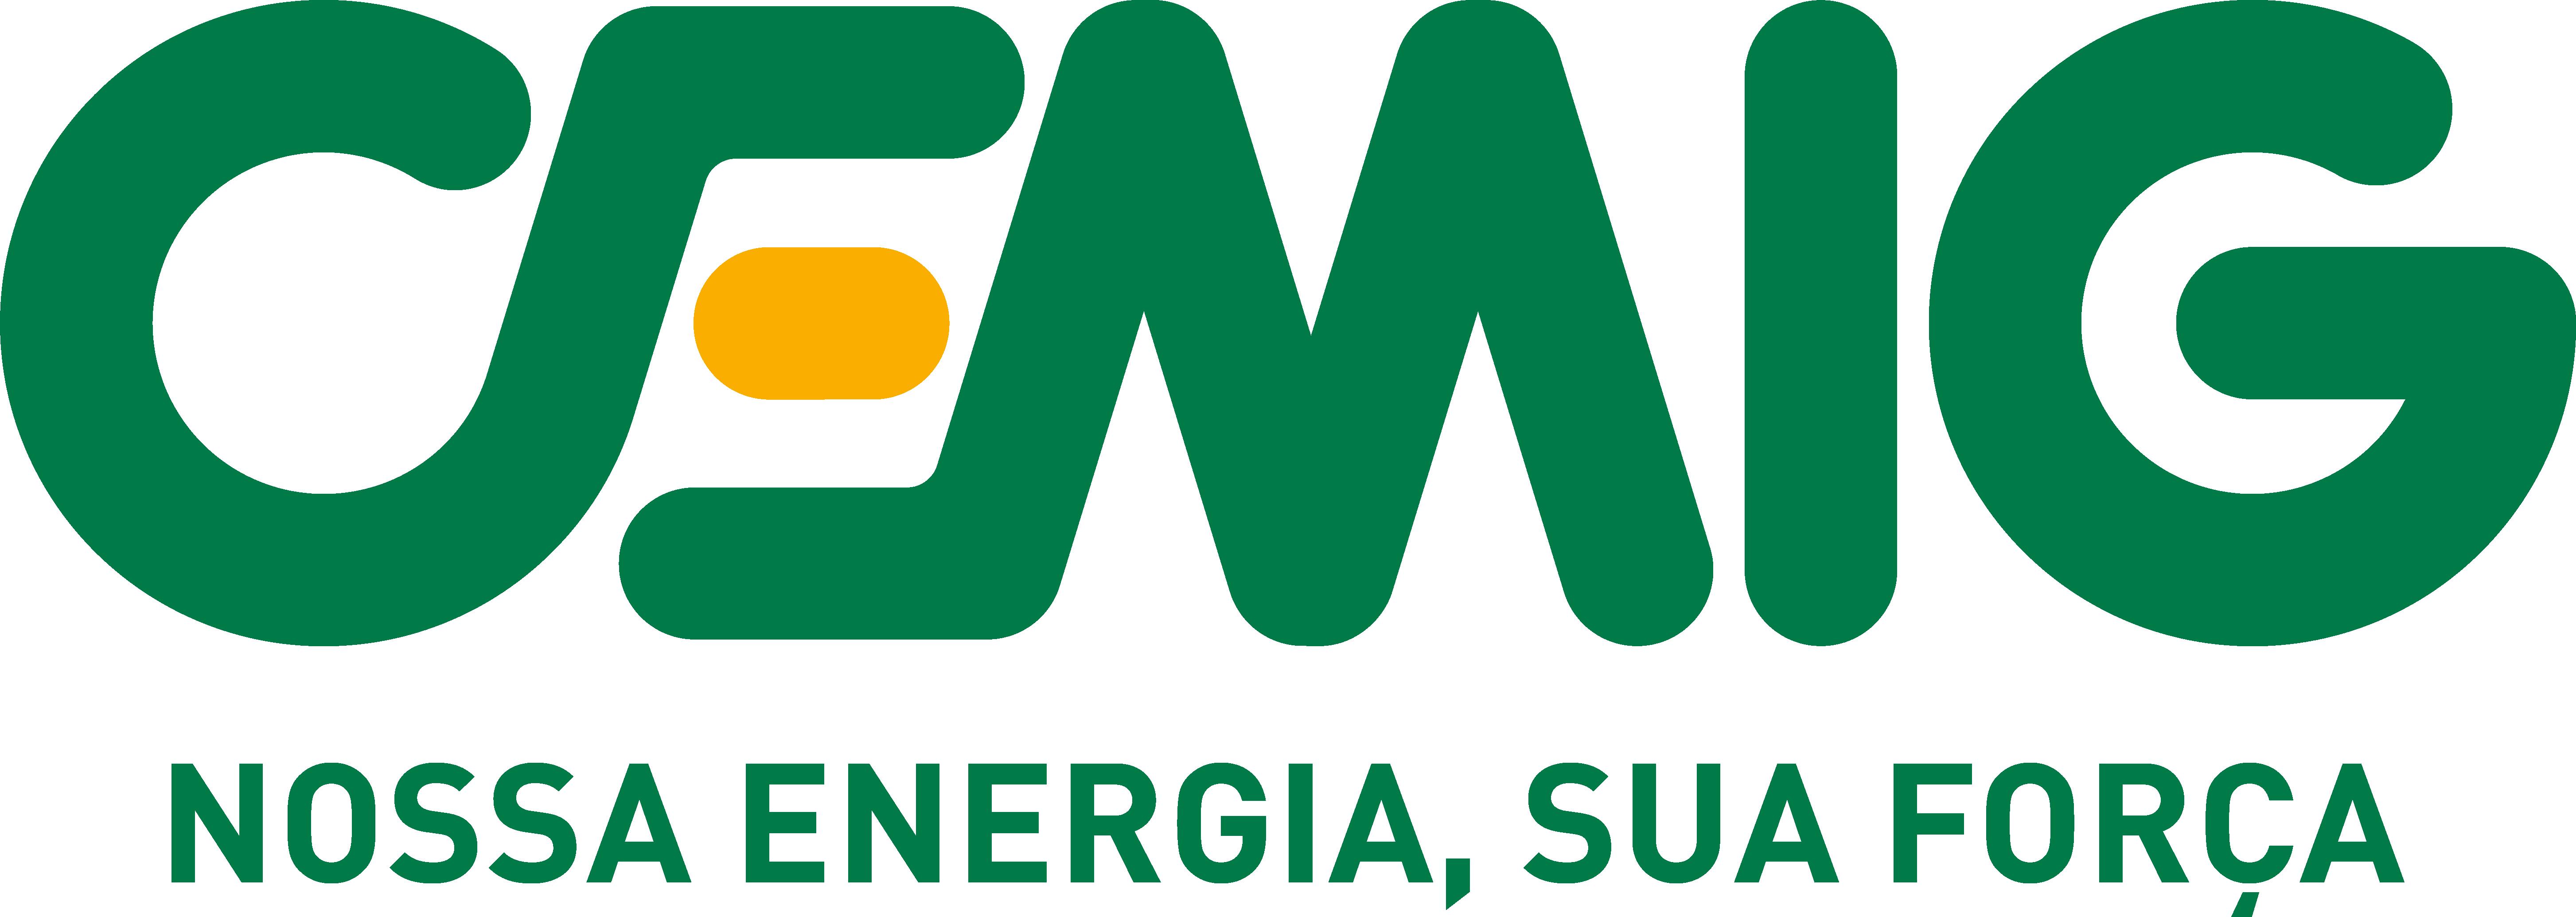 Logotipo CEMIG